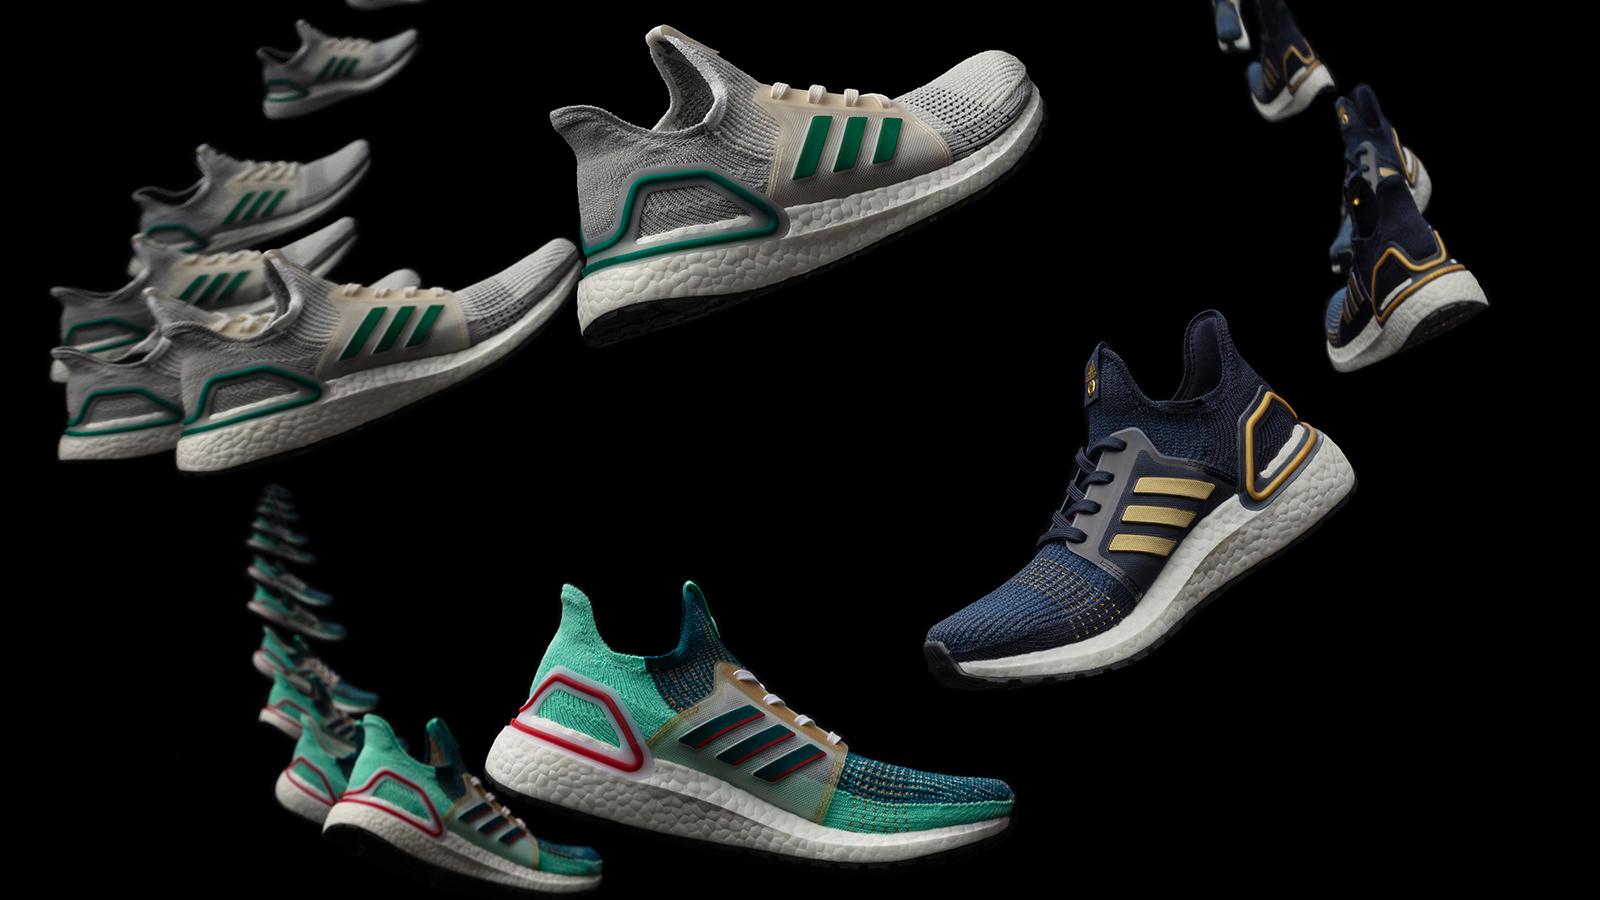 Adidas-Consortium-UltraBOOST-19-Running-Shoe